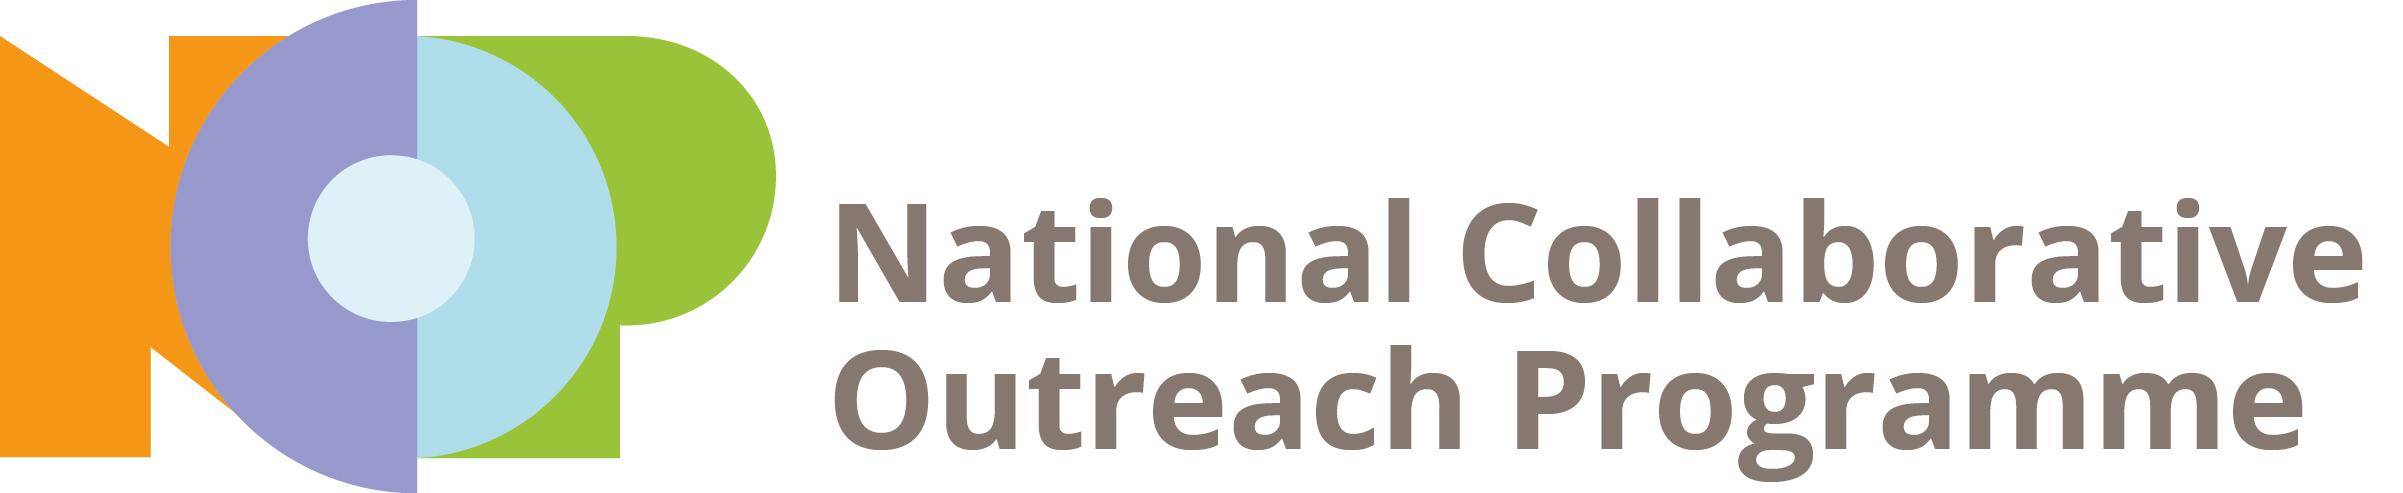 NCOP logo National RGB.jpg